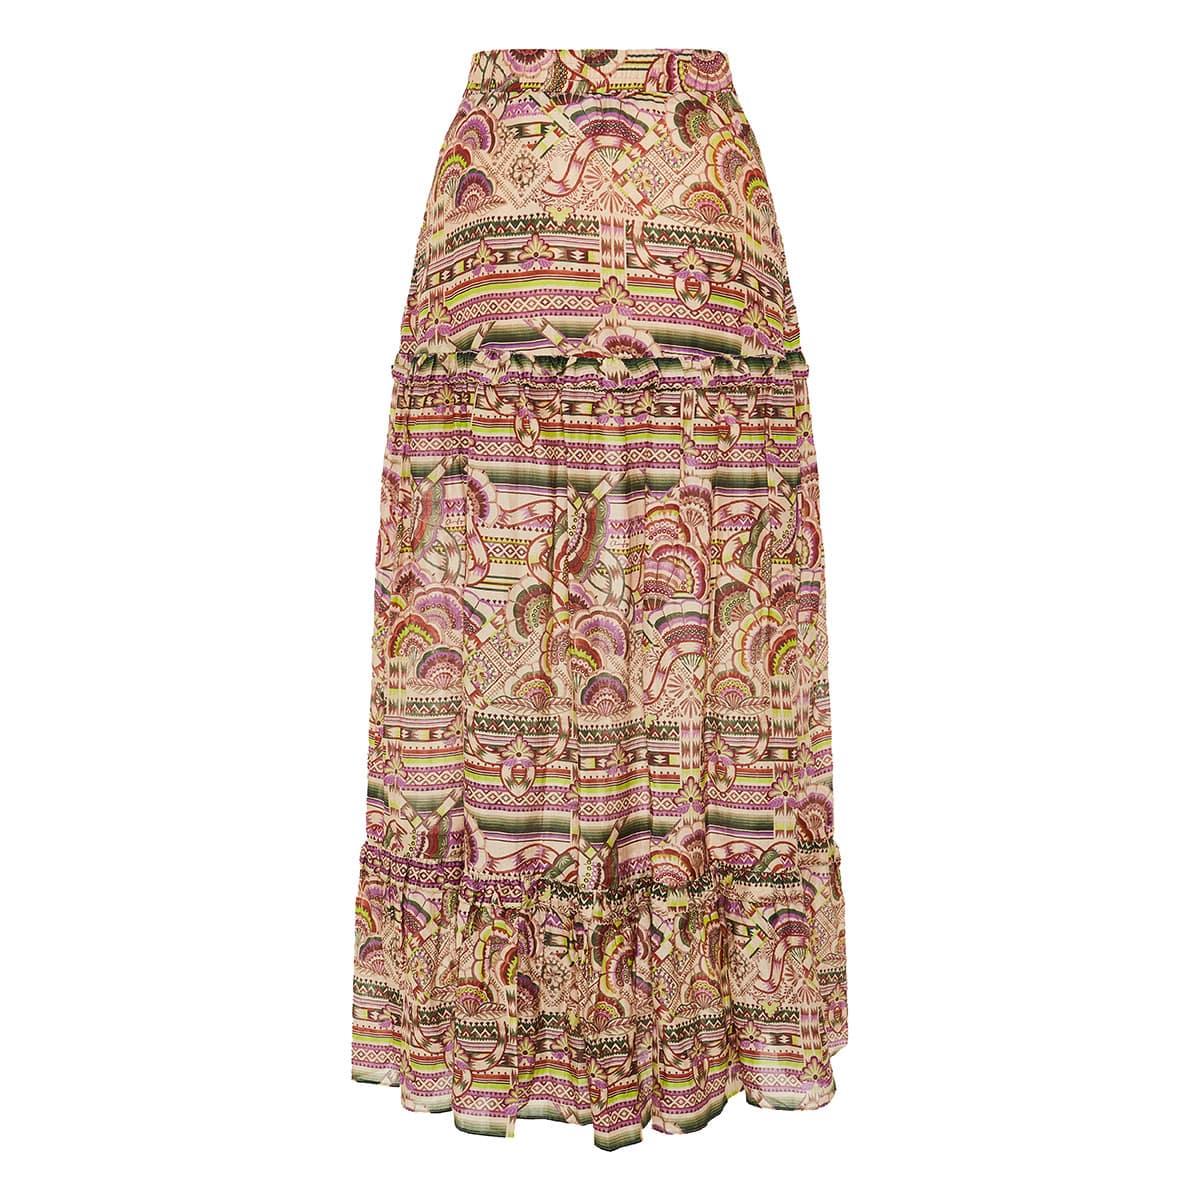 Nina printed long tiered skirt